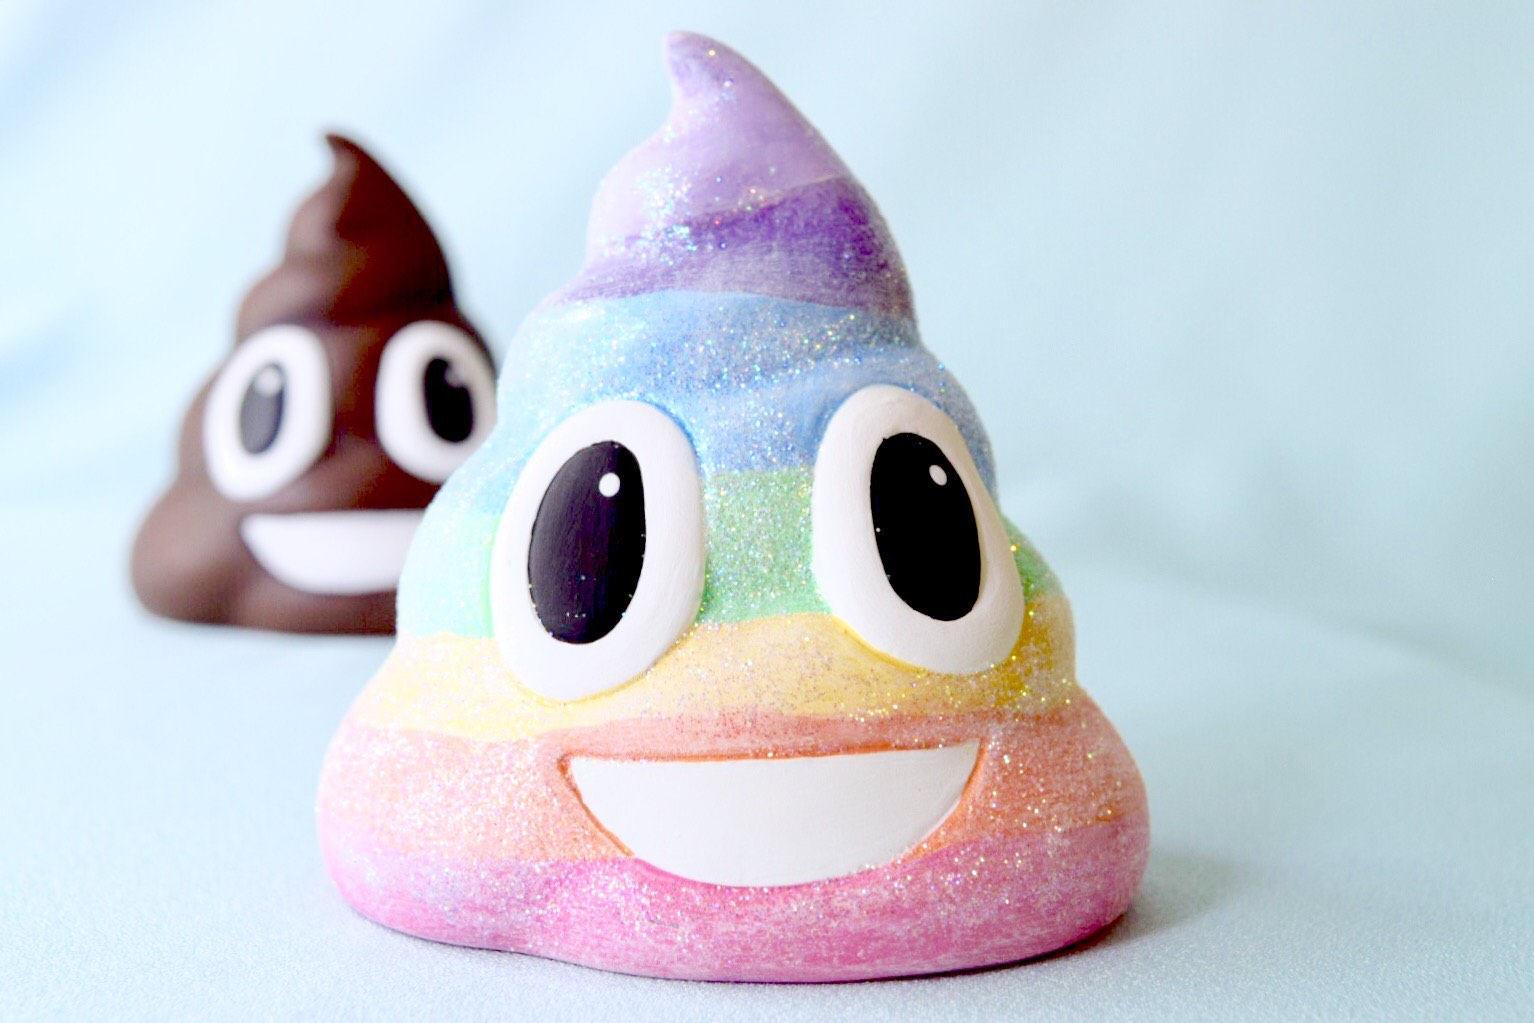 how to draw a rainbow poop emoji